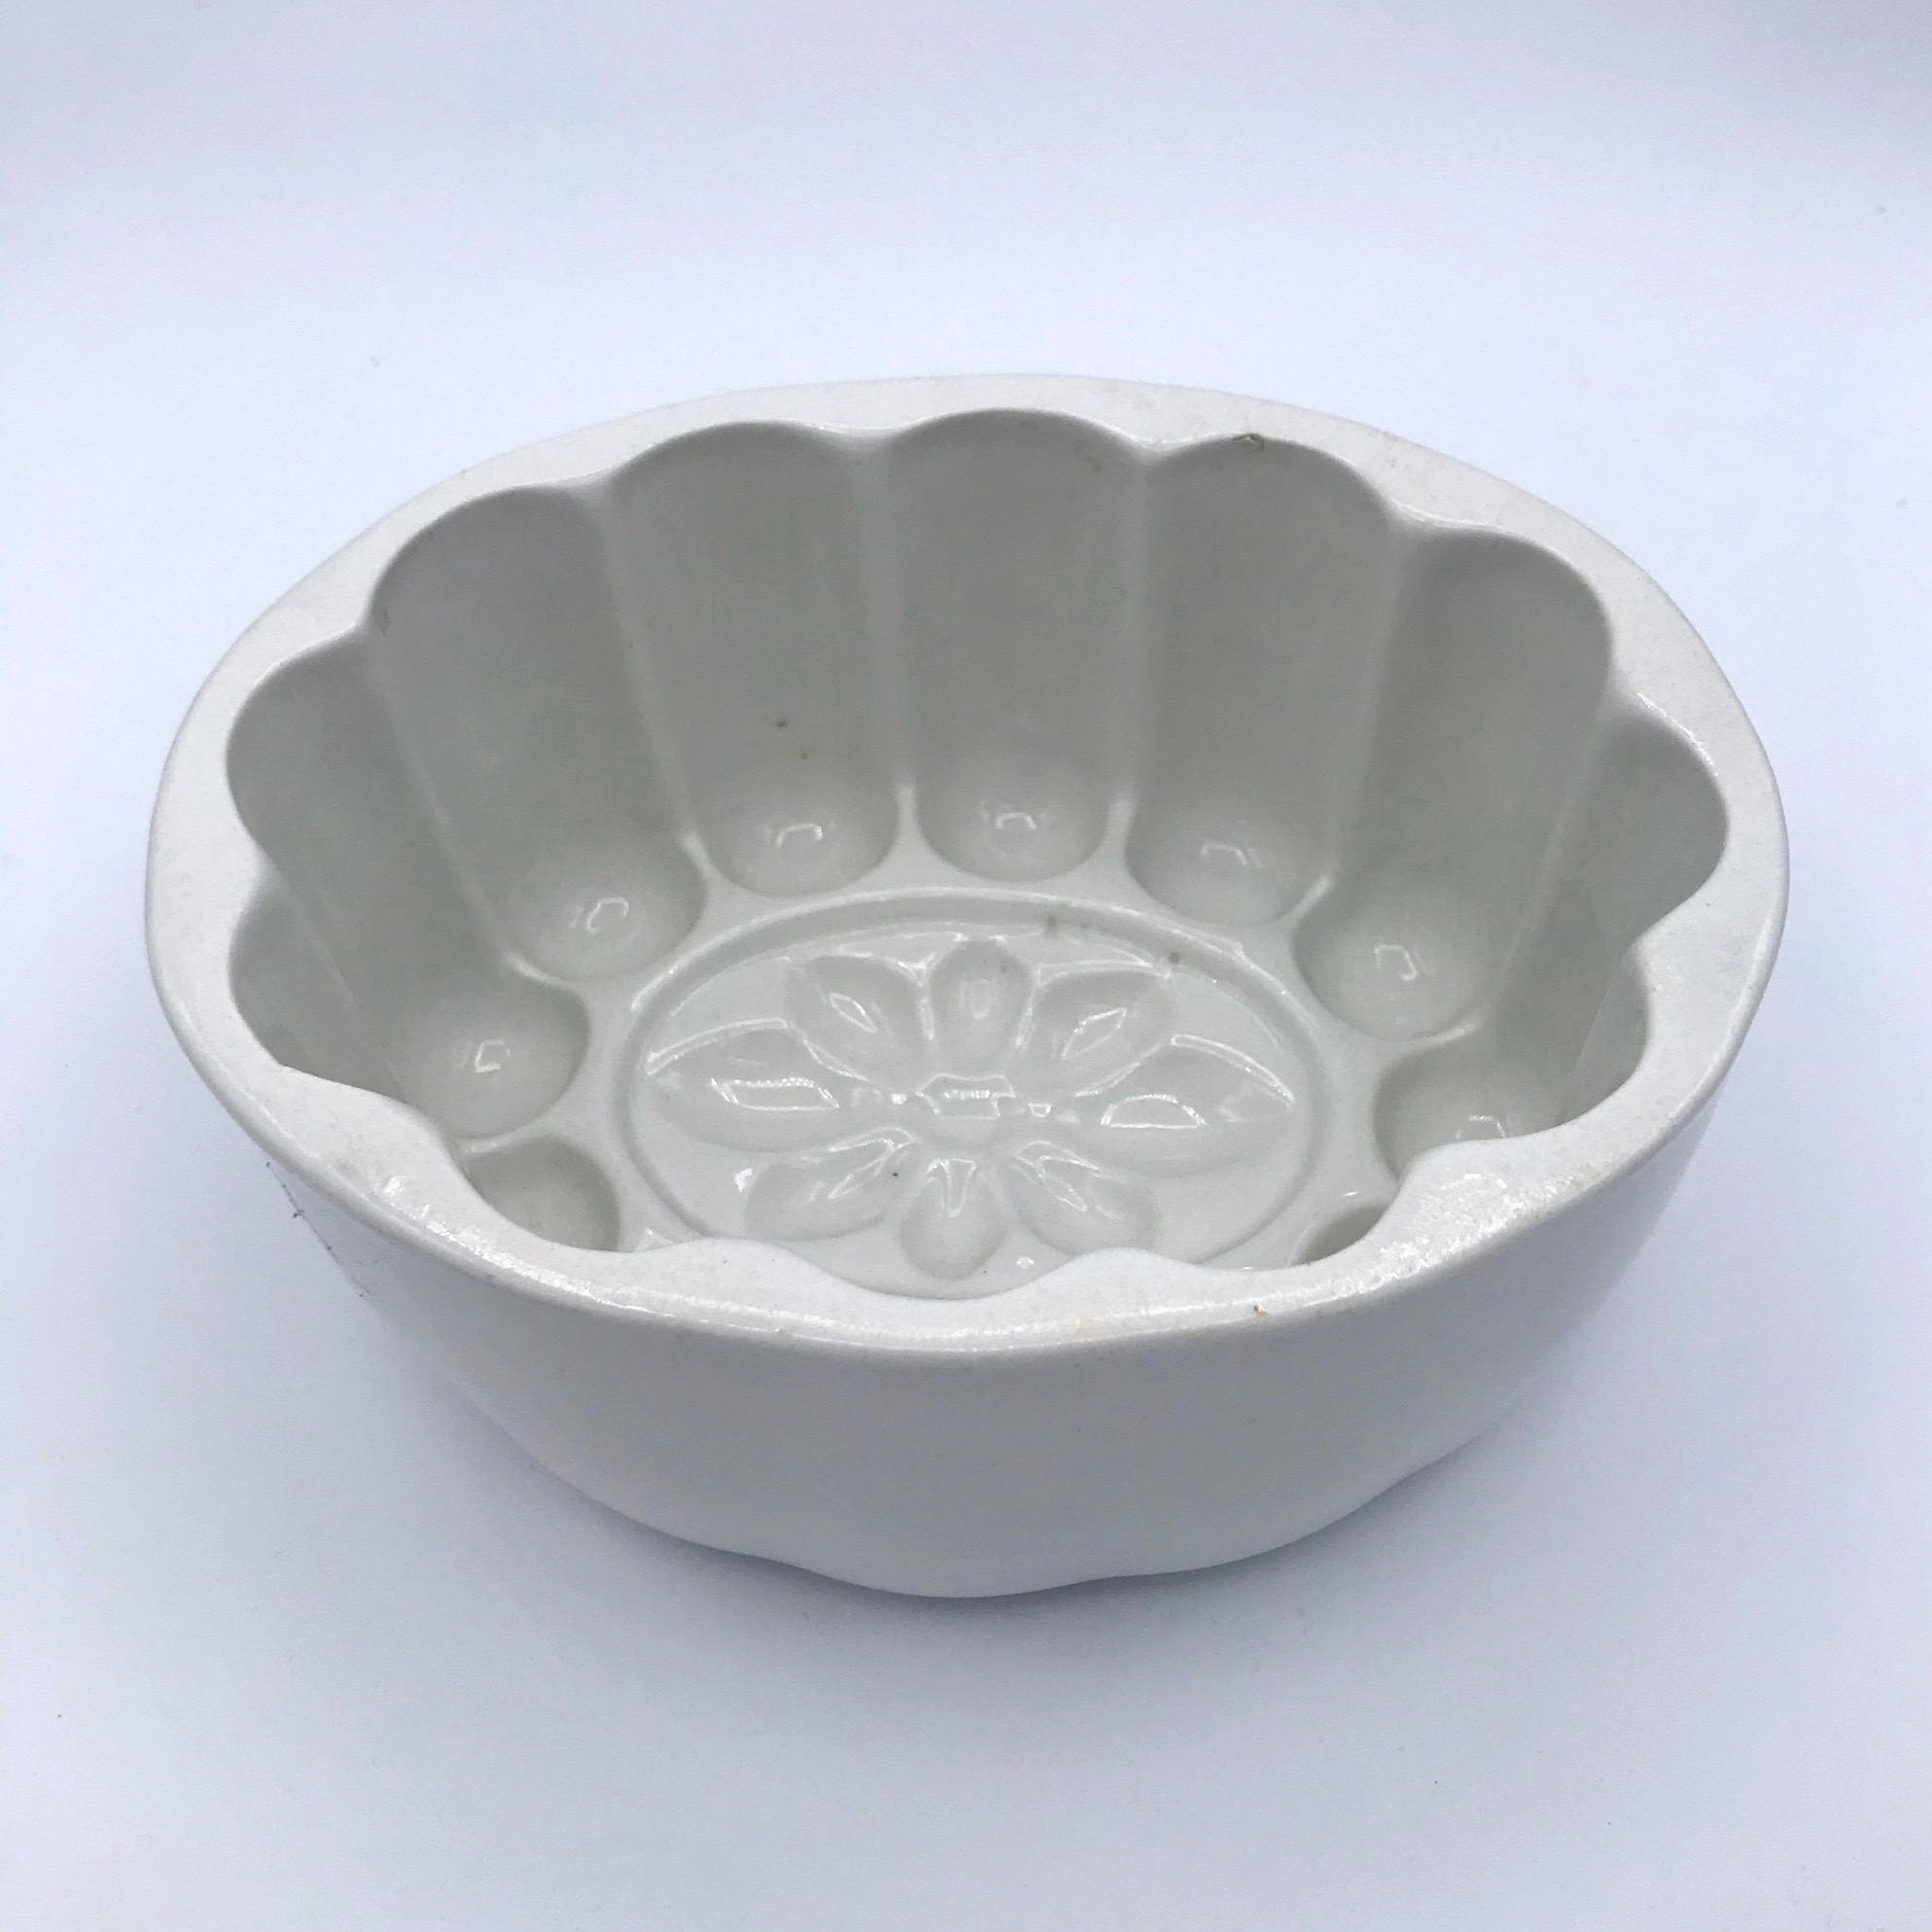 Oval Jelly Mould